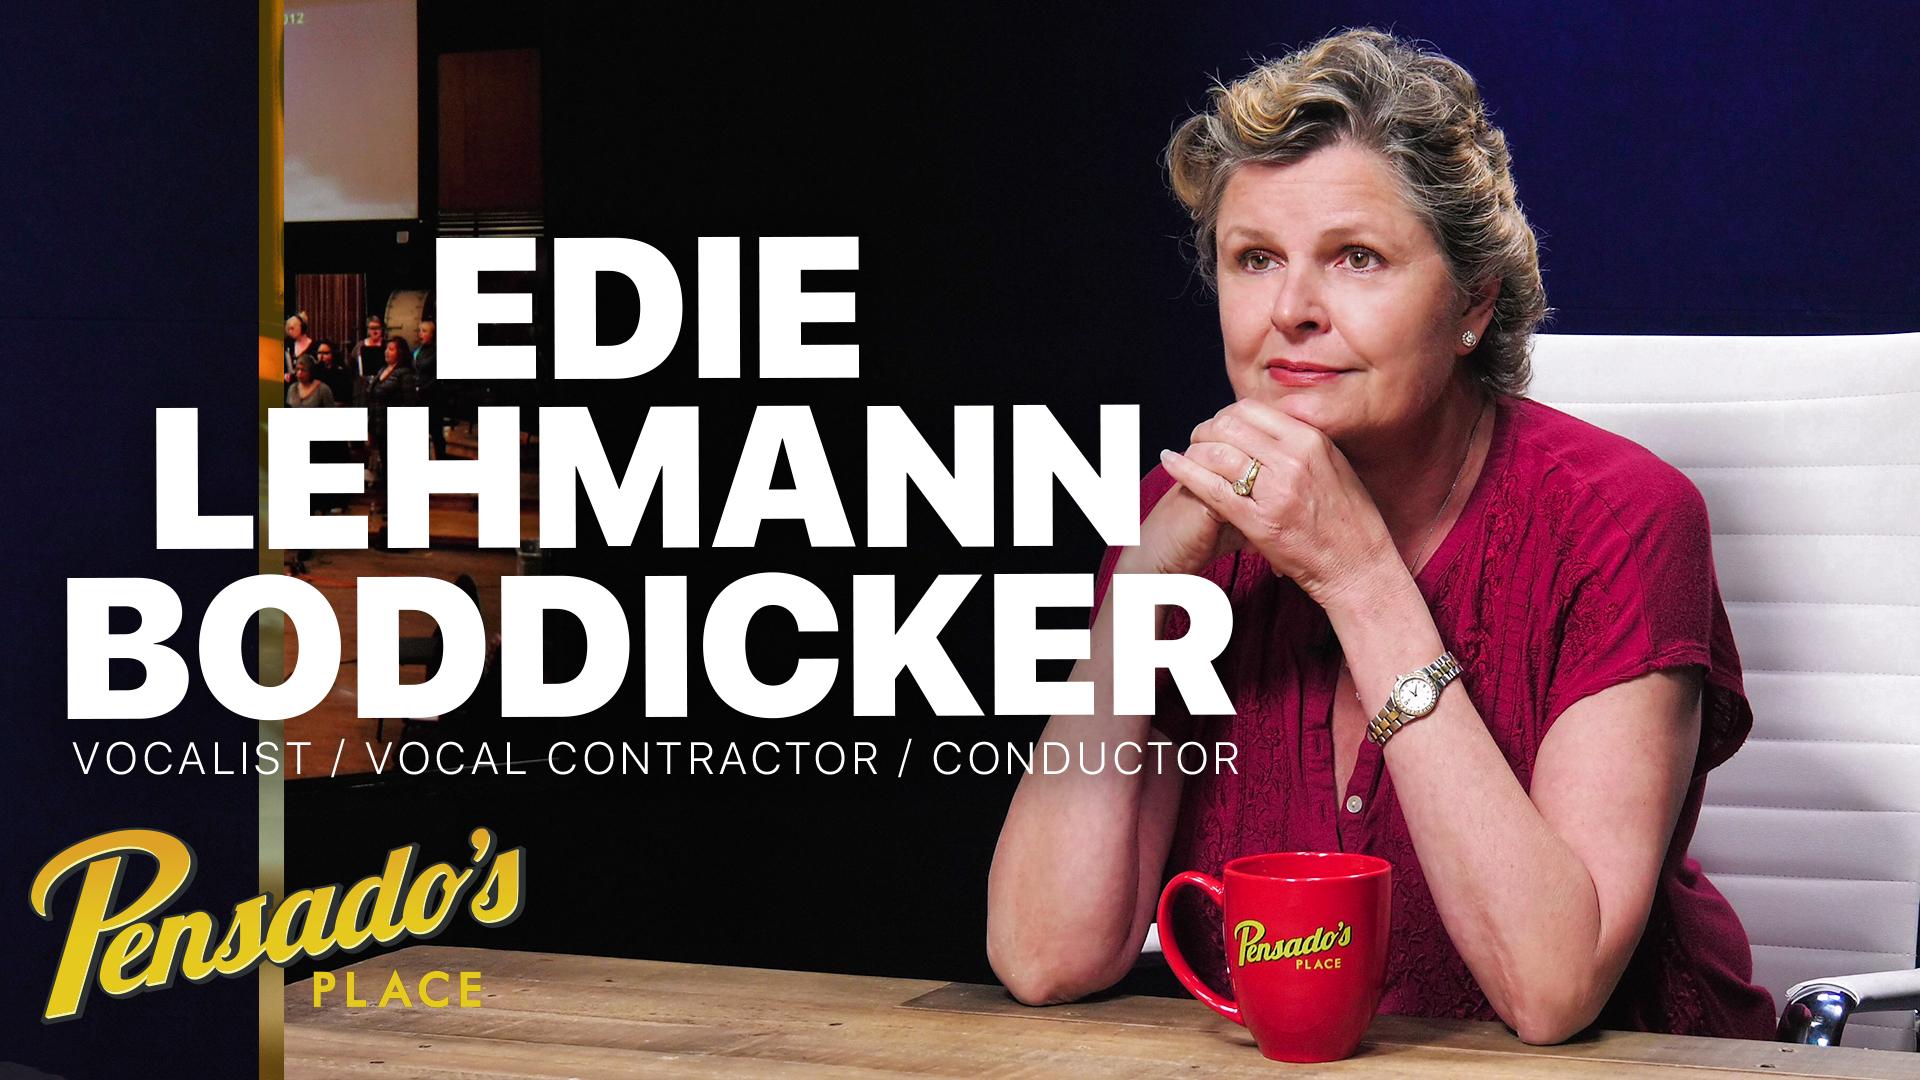 Vocalist / Vocal Contractor / Conductor, Edie Lehmann Boddicker